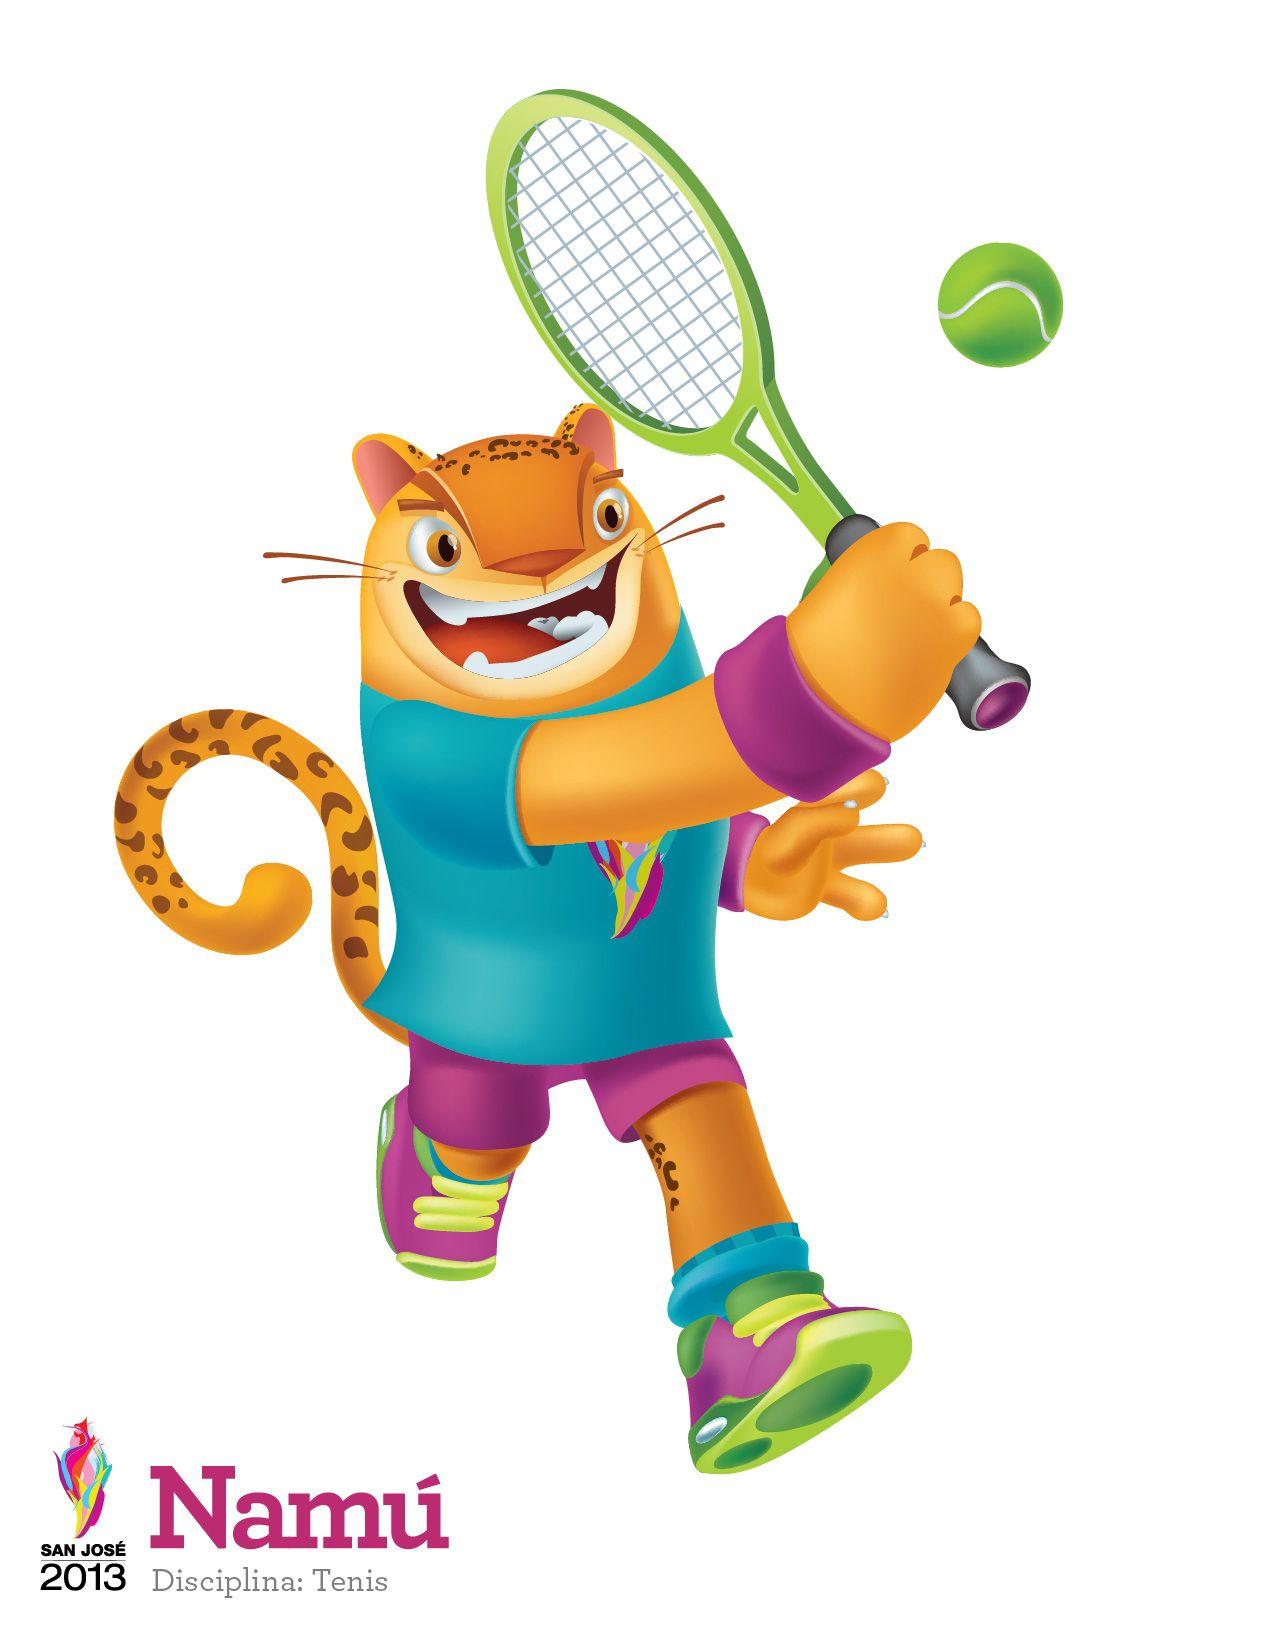 Namu Mascota De Los Juegos Centroamericanos San Jose 2013 O Disciplina Tenis